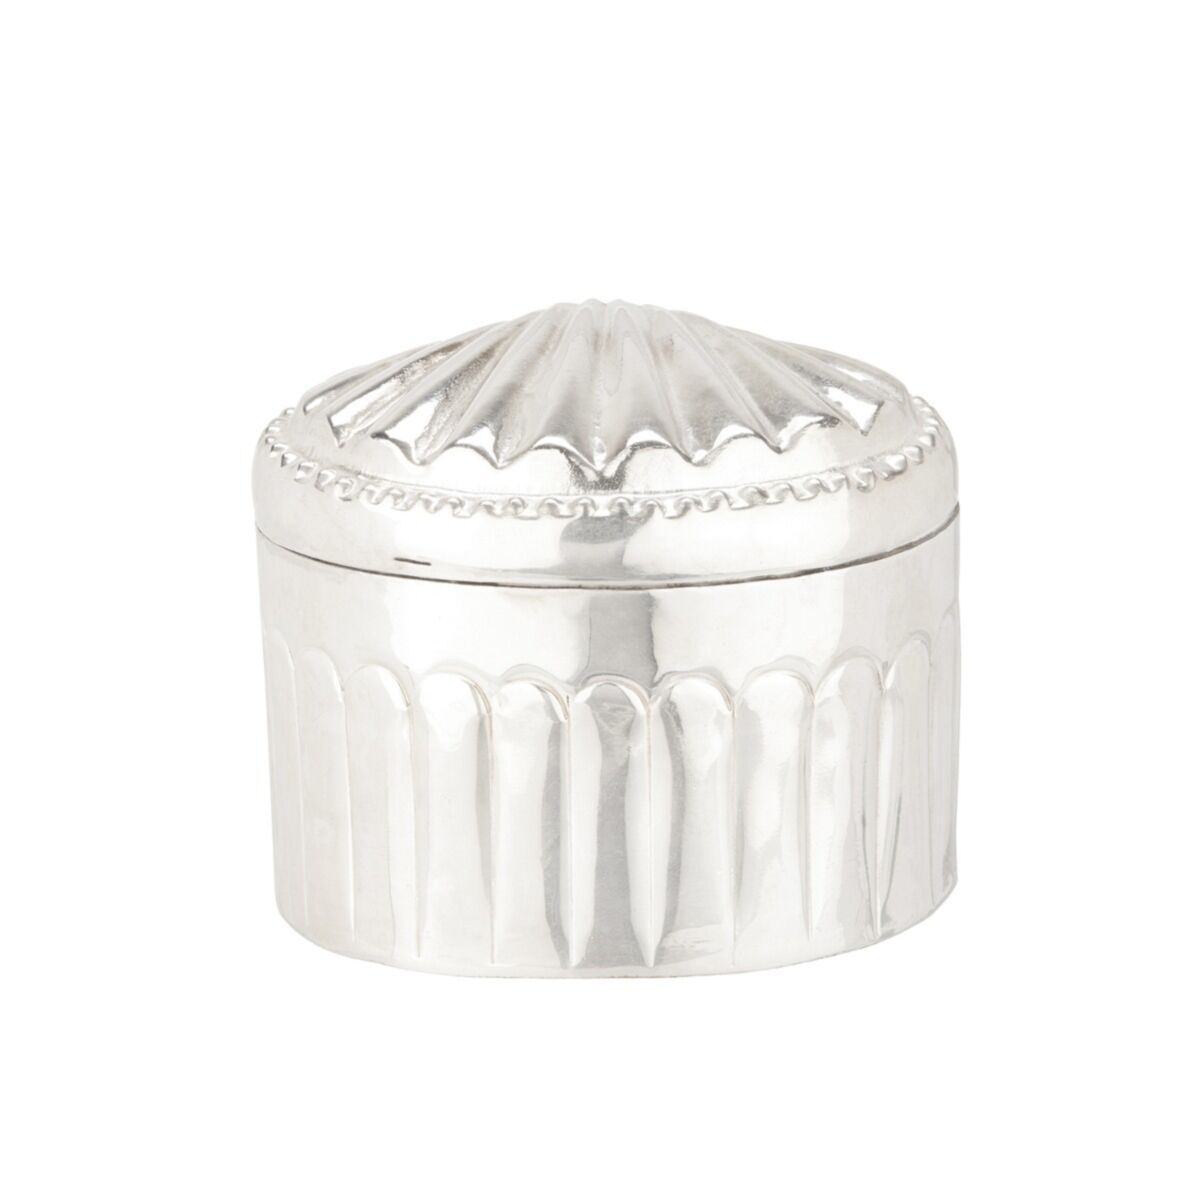 Coquillage Box image